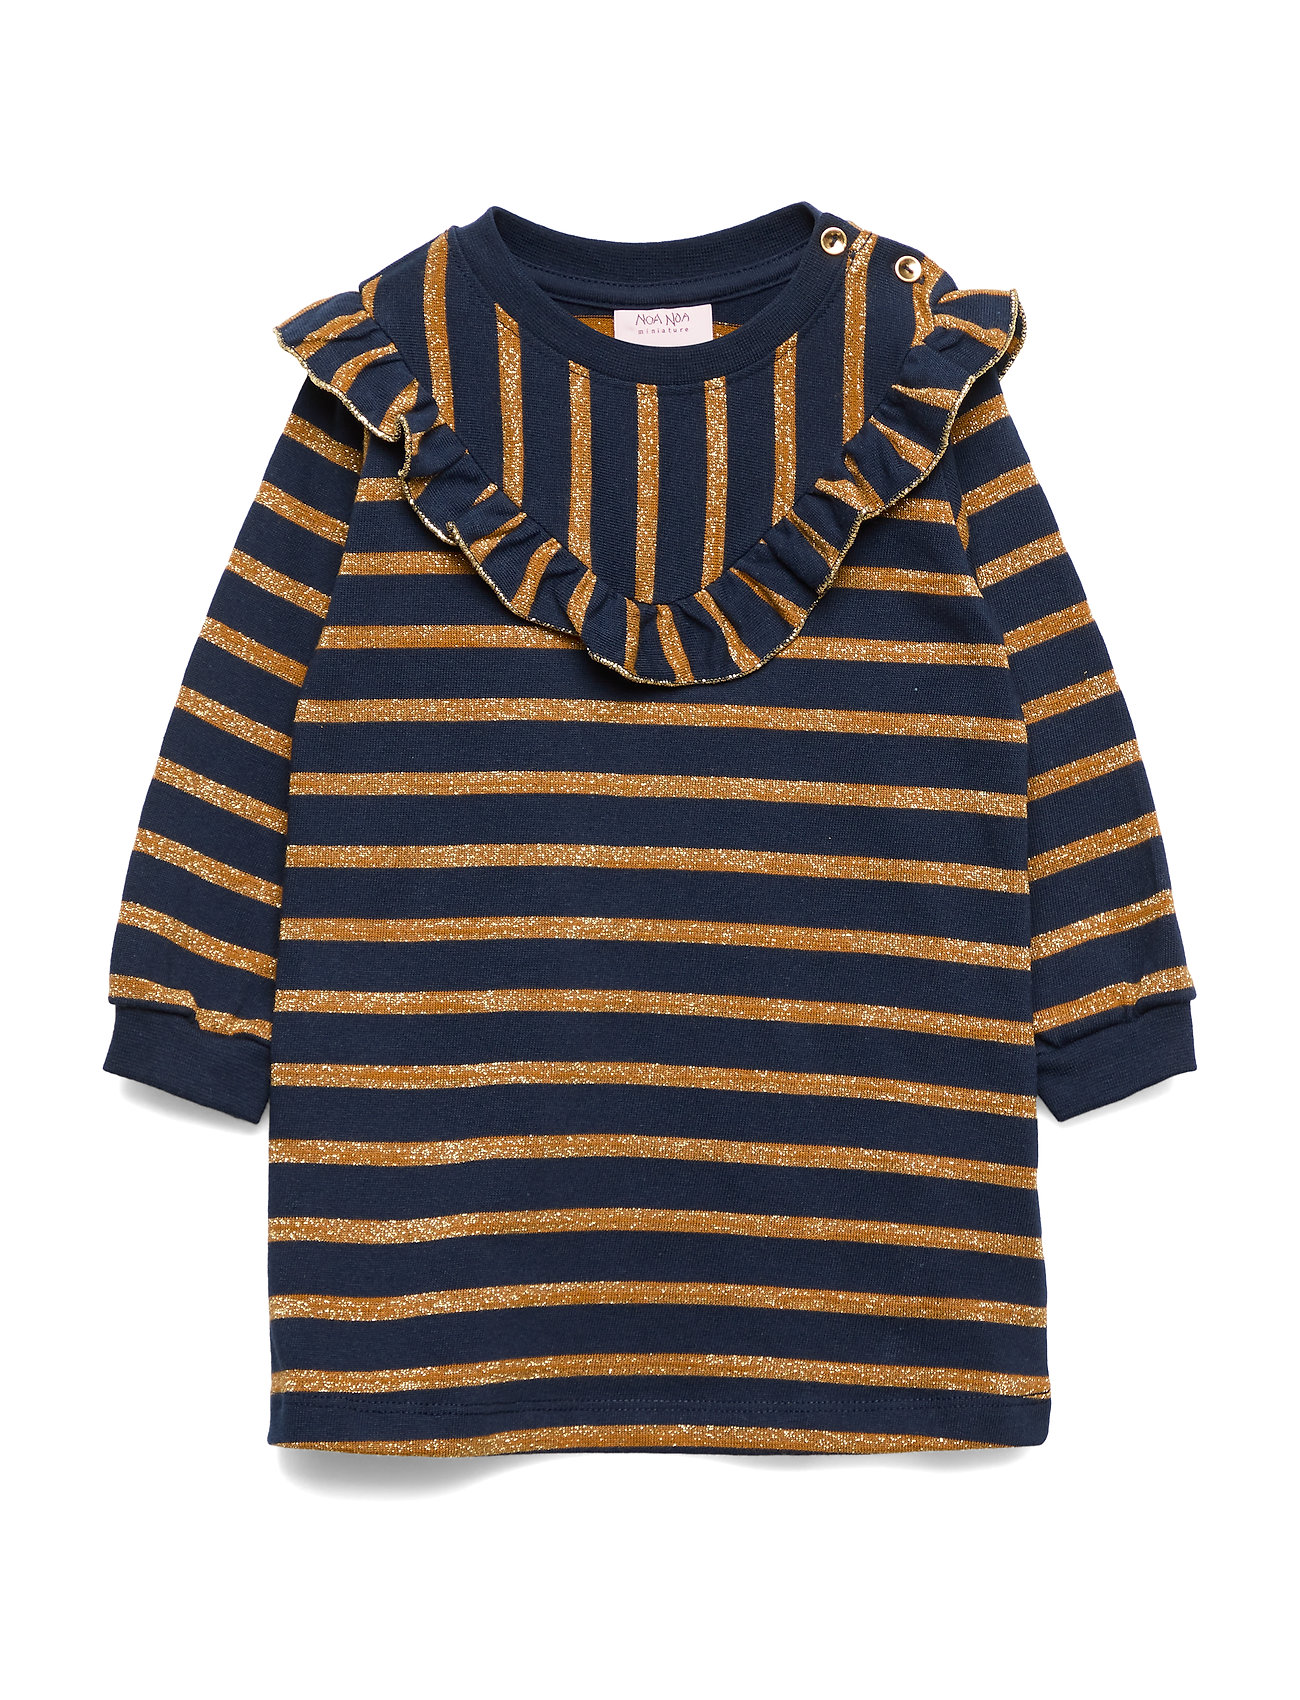 Noa Noa Miniature Dress long sleeve - NAVY BLAZER